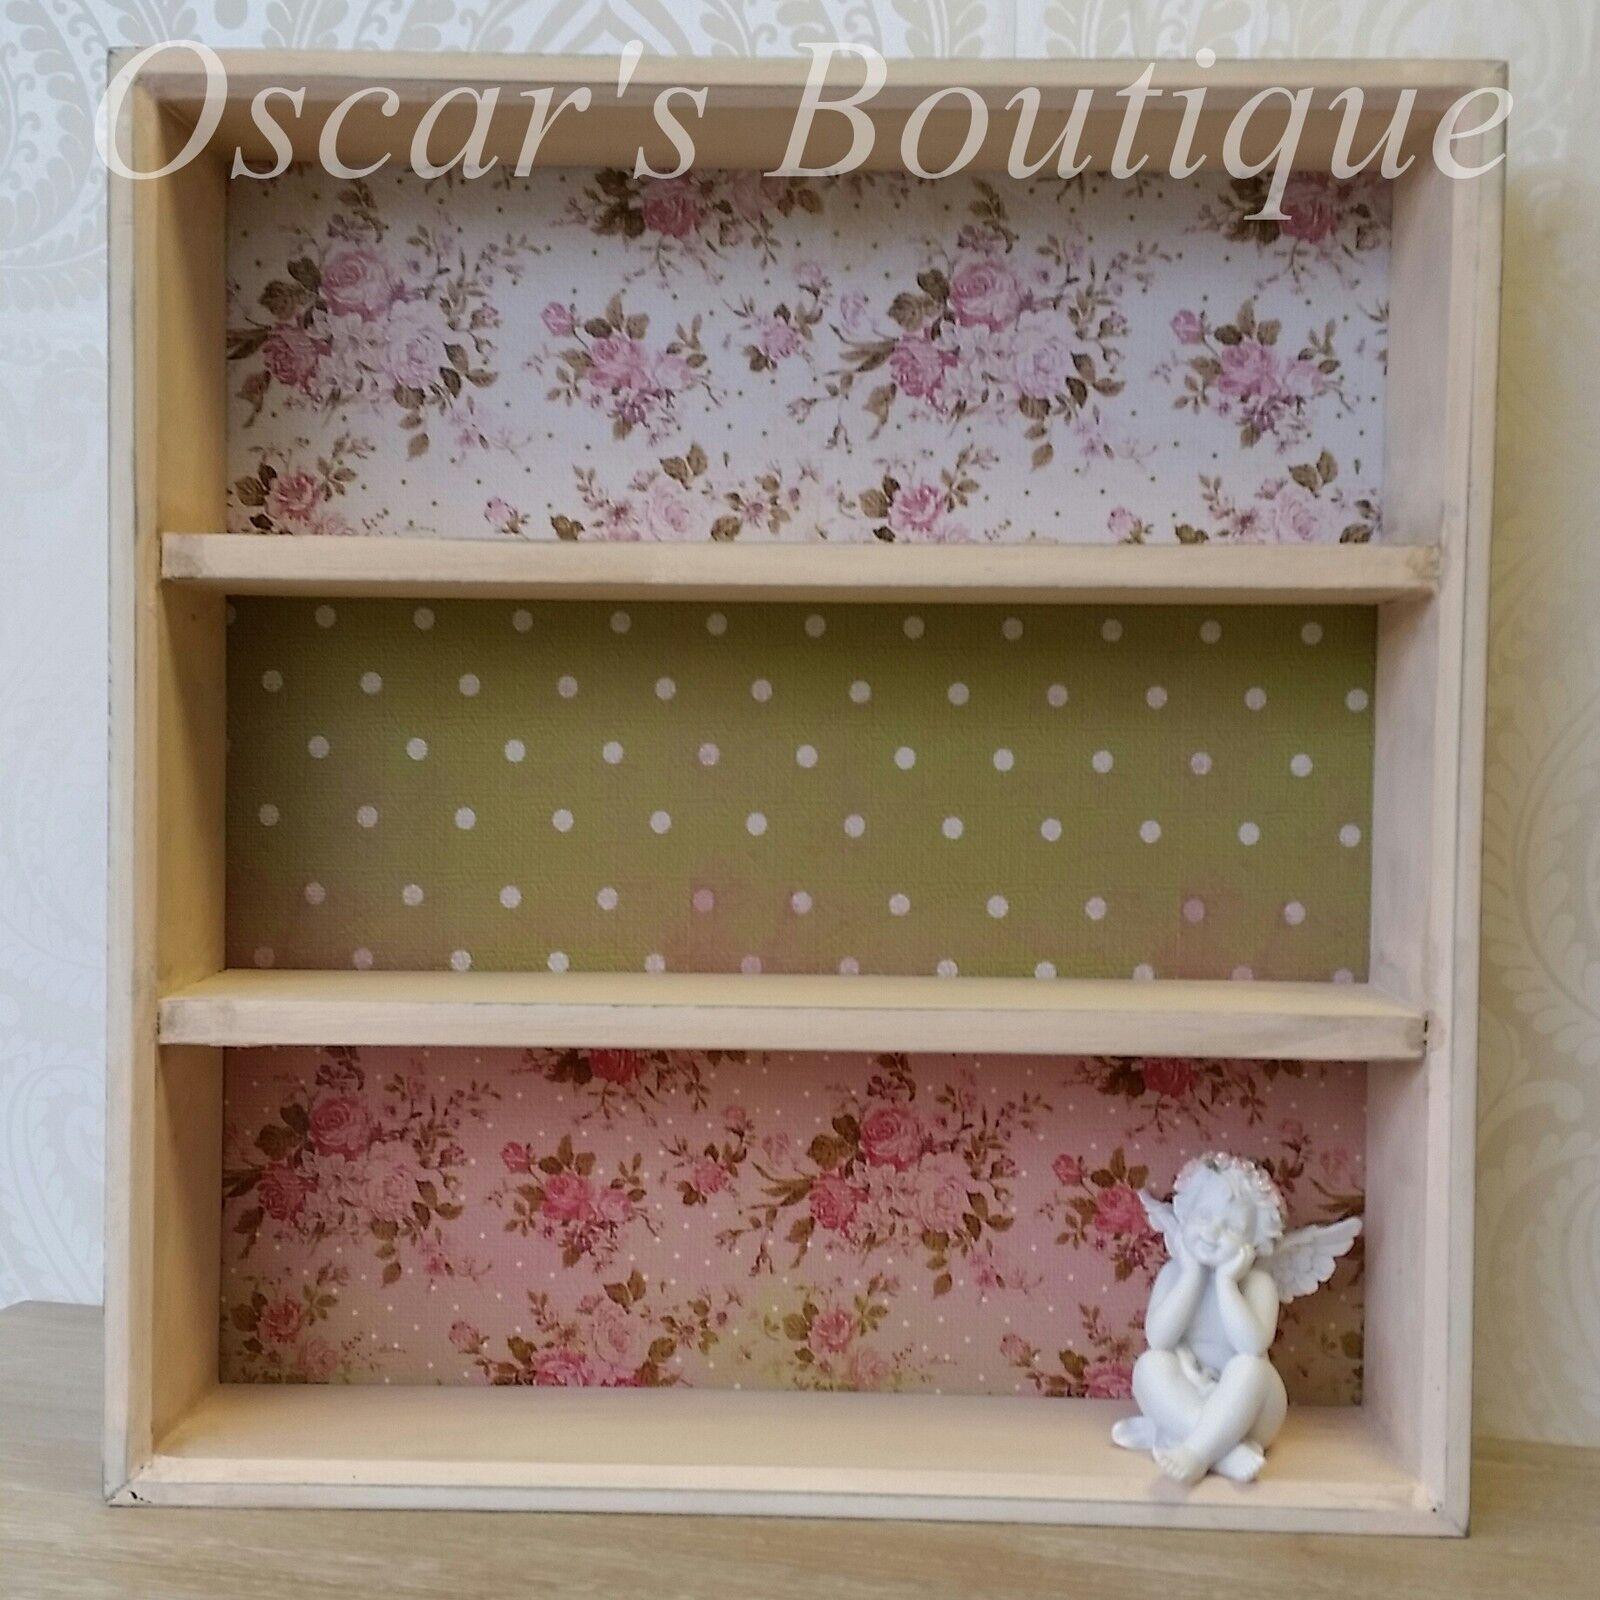 shabby chic vintage style wall display cabinet shelf unit. Black Bedroom Furniture Sets. Home Design Ideas